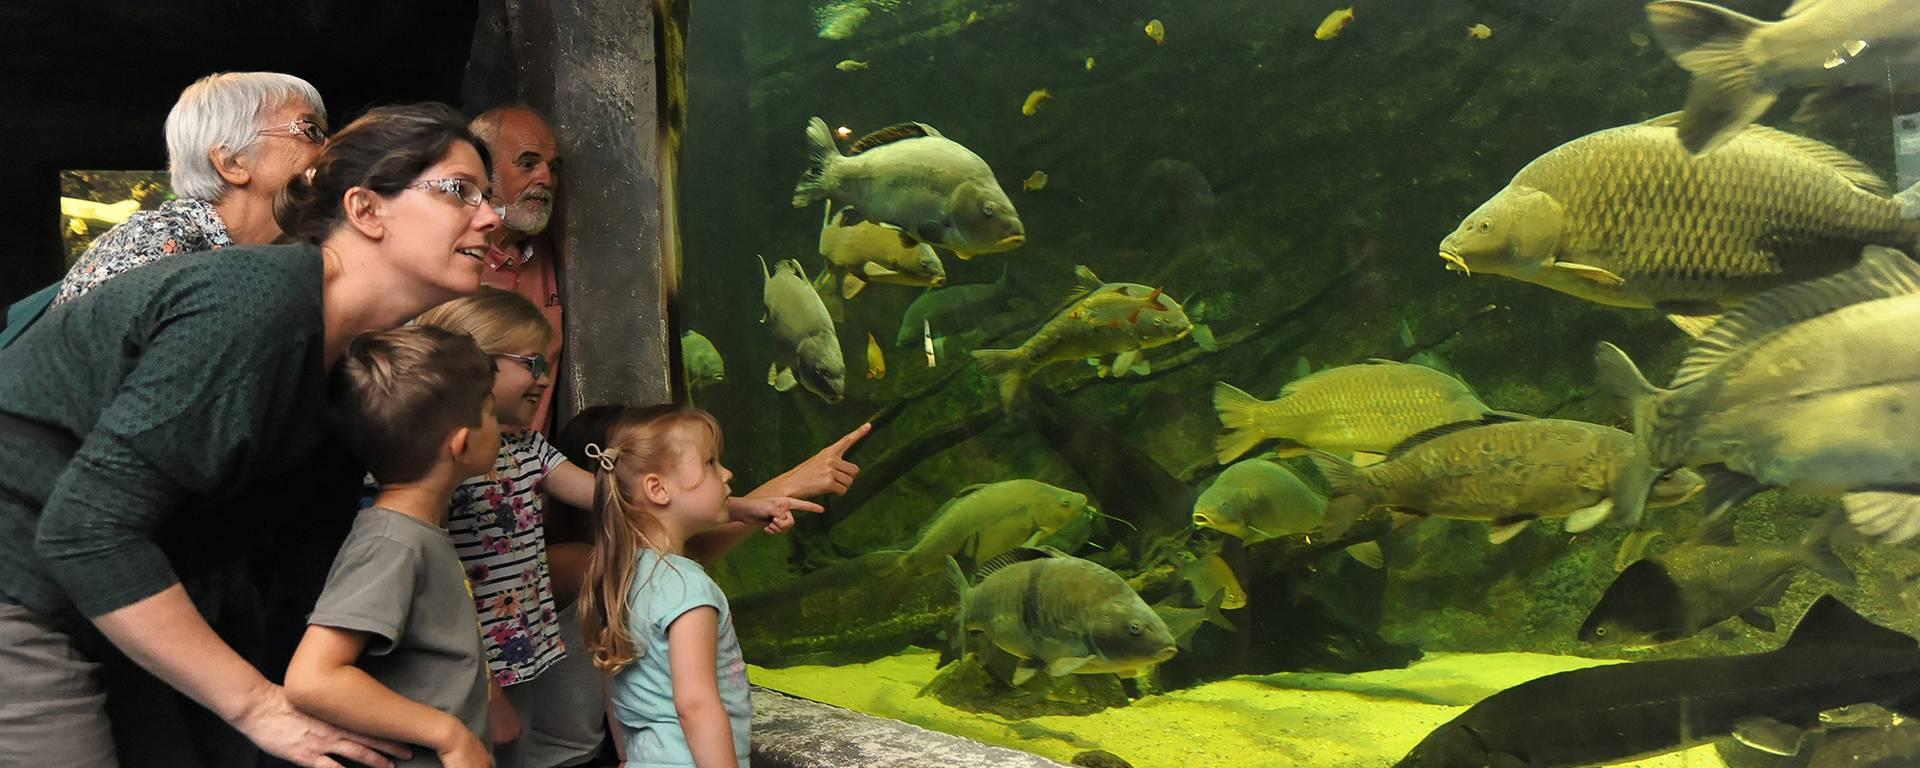 Visite de l'aquarium de Pescalis pendant les vacances